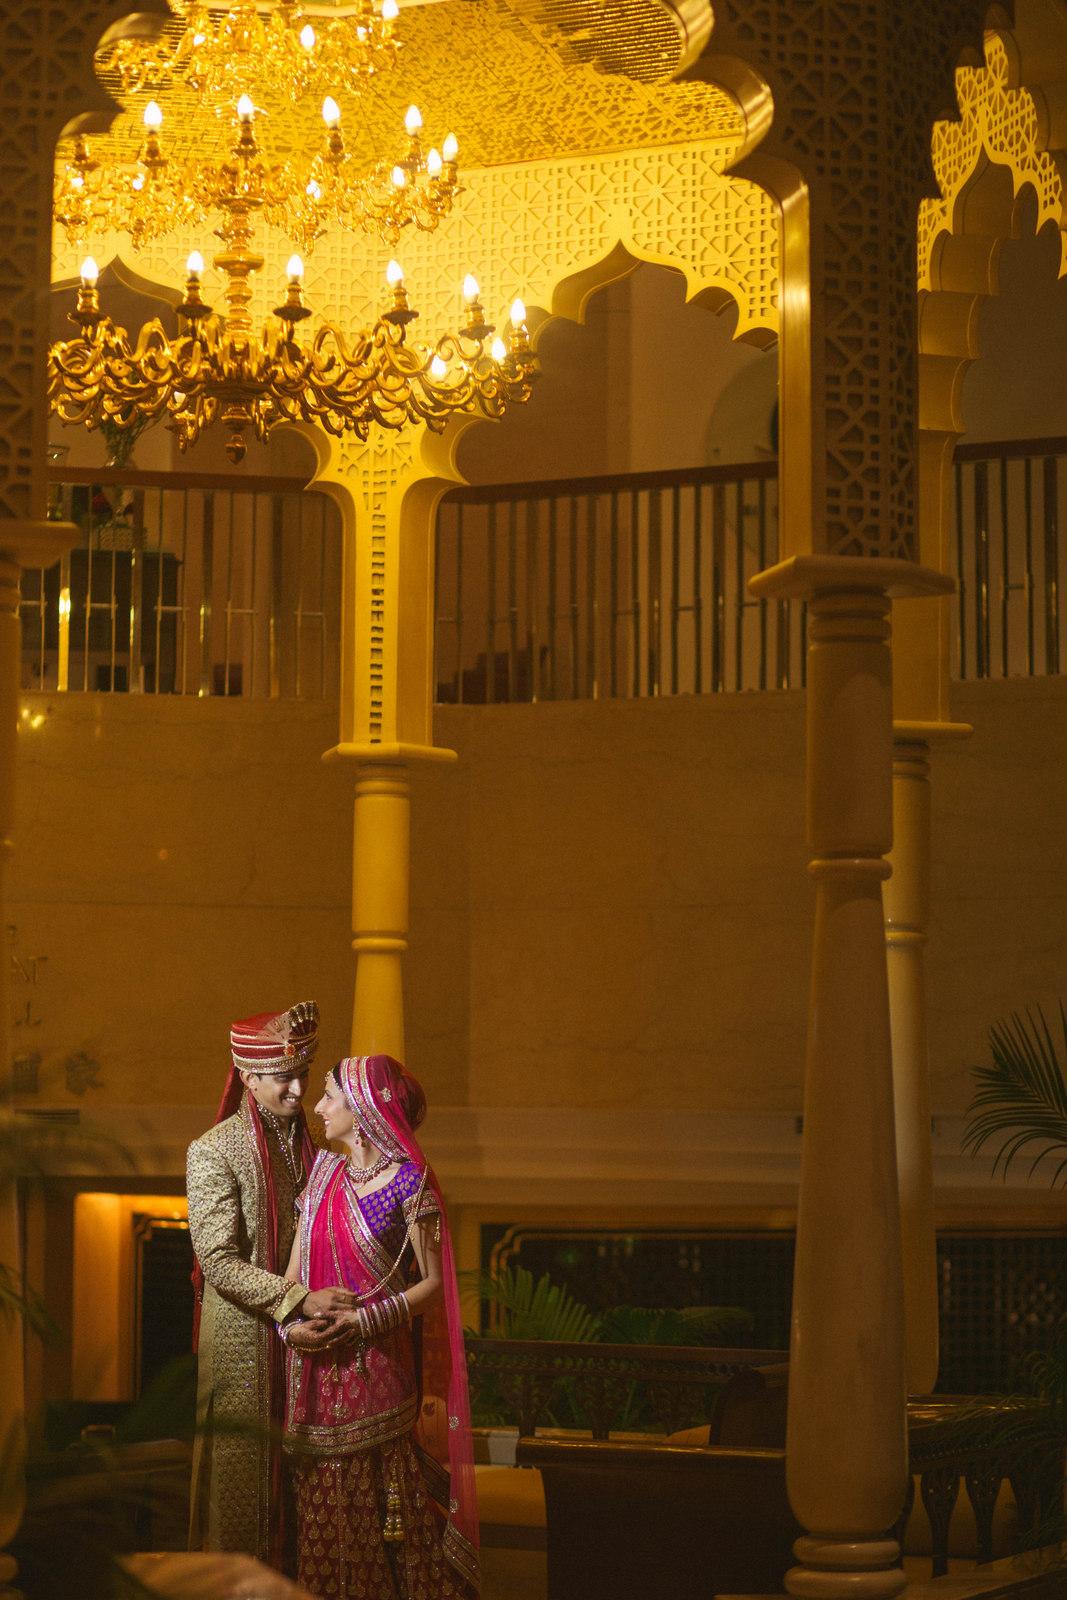 hindu-wedding-mumbai-into-candid-photography-dk-42.jpg